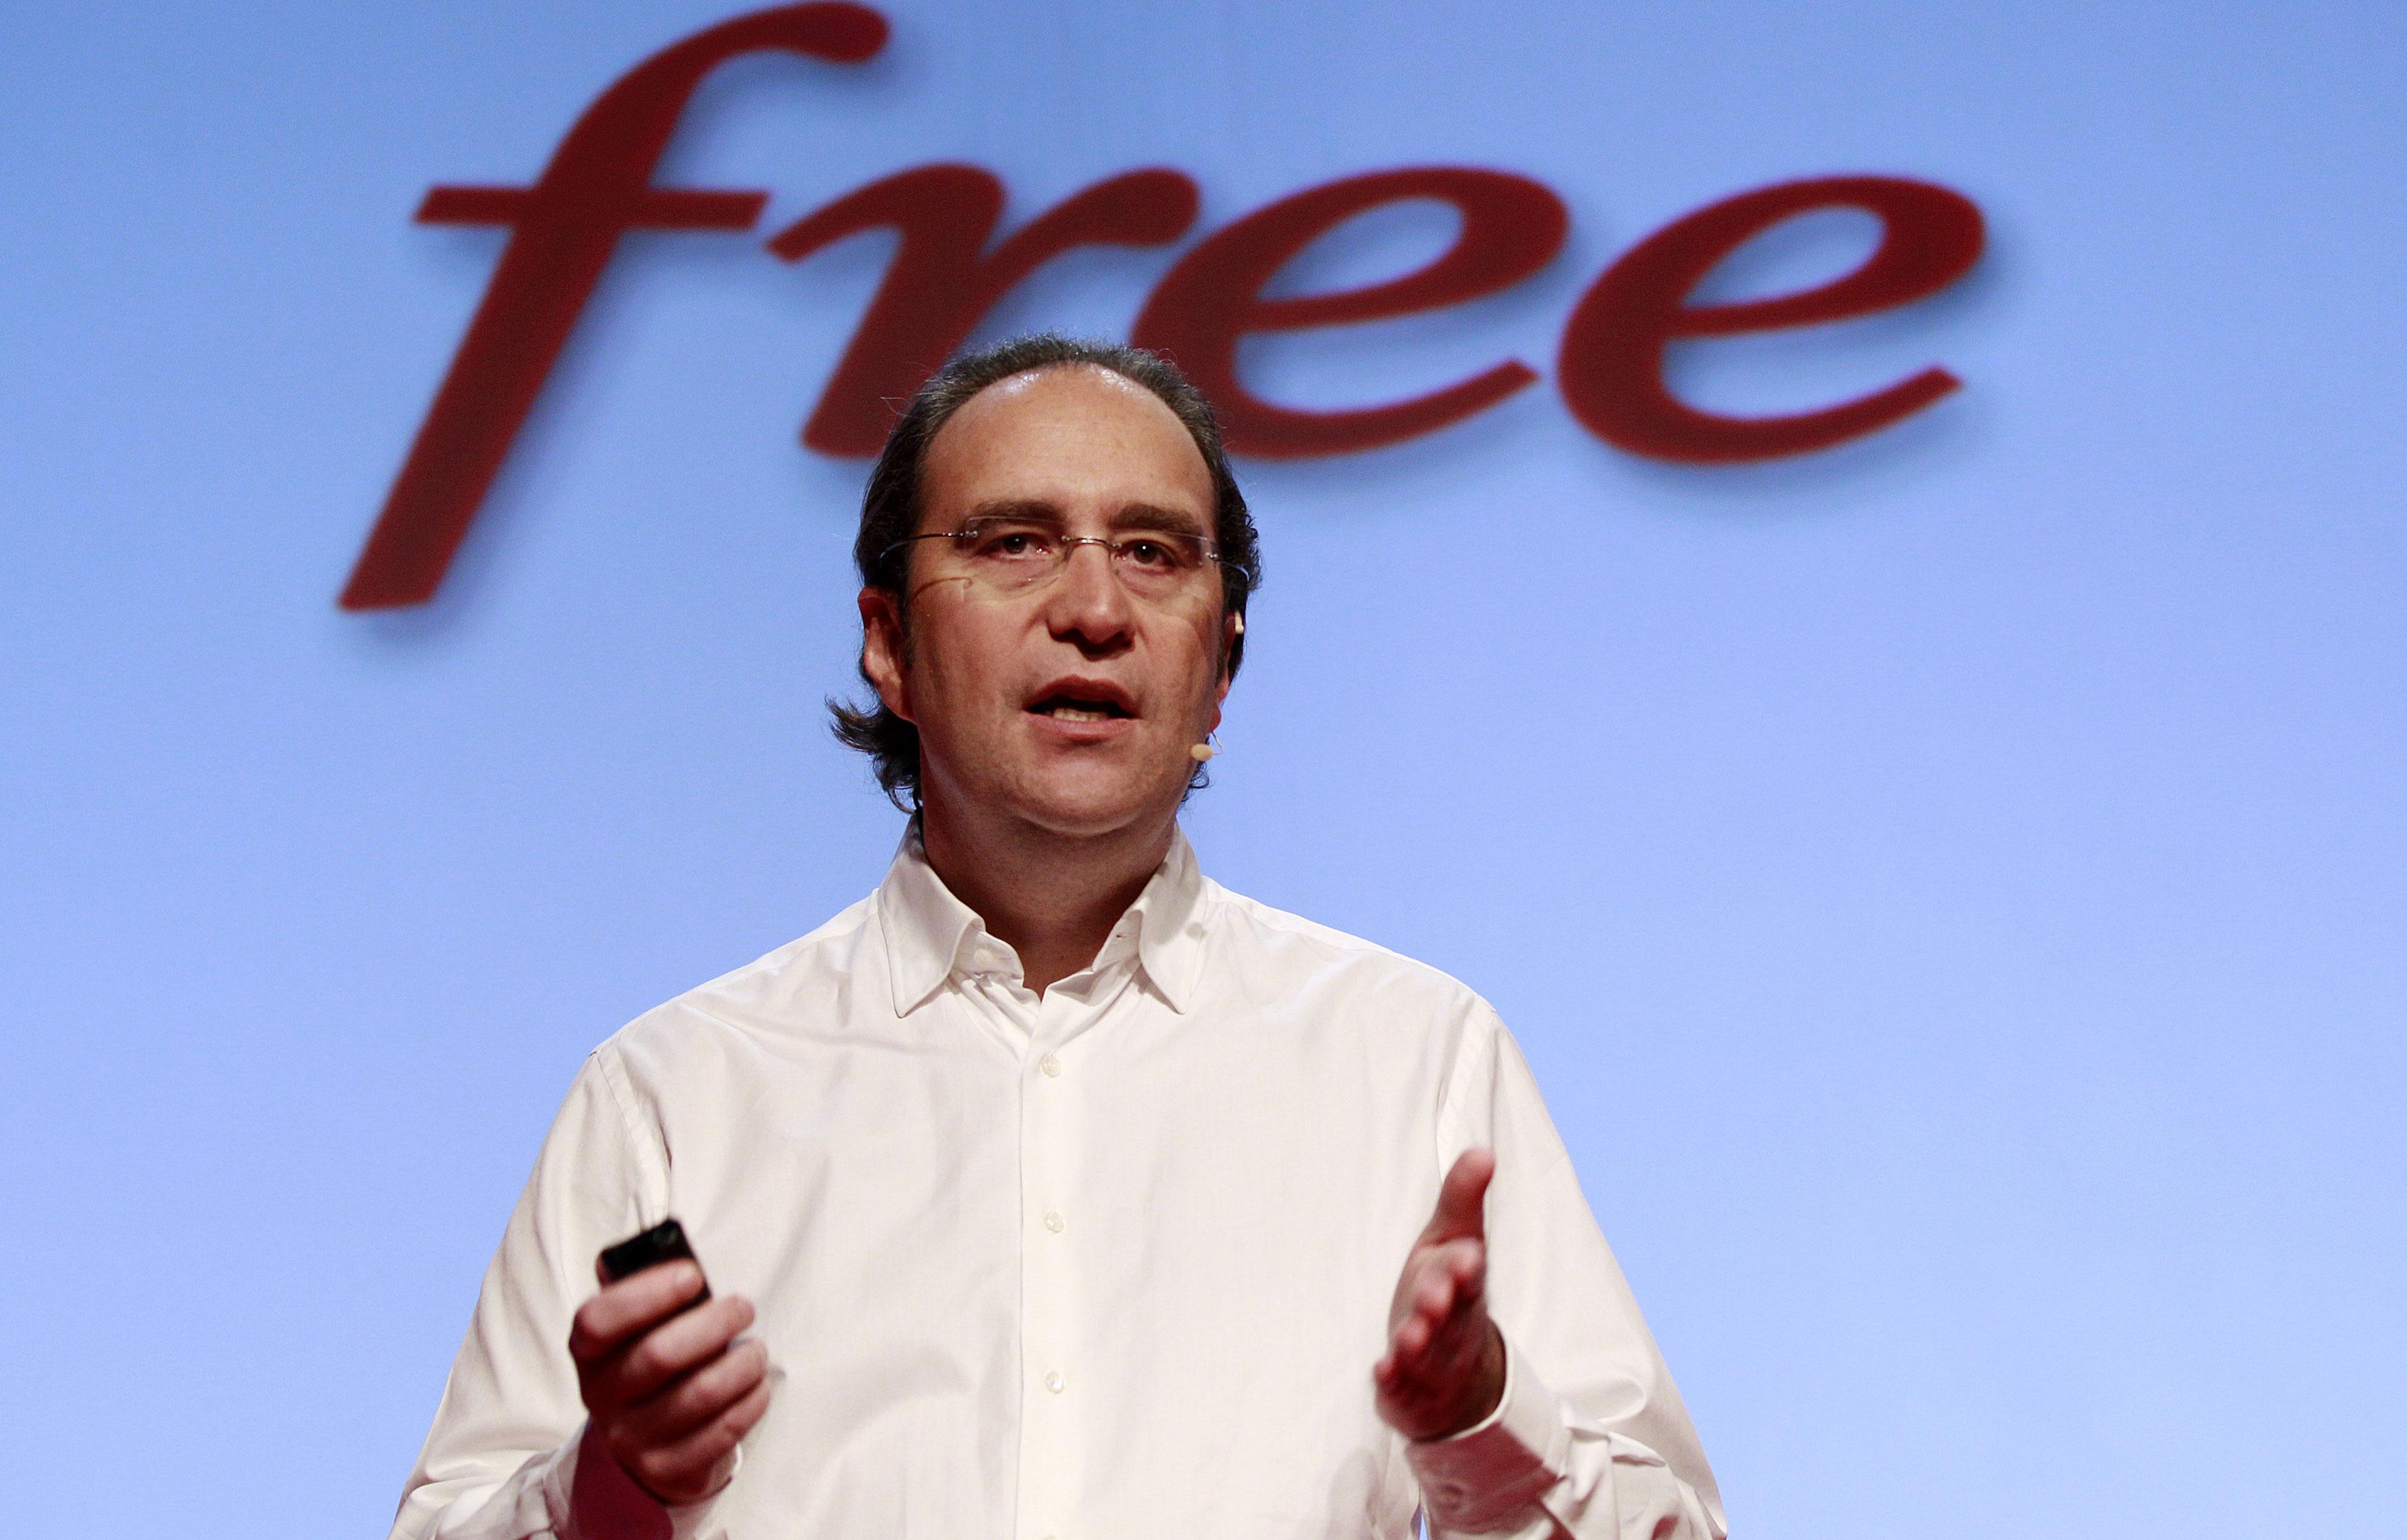 Xavier Niel biographie - Xavier Niel + Free - La vie des entreprises